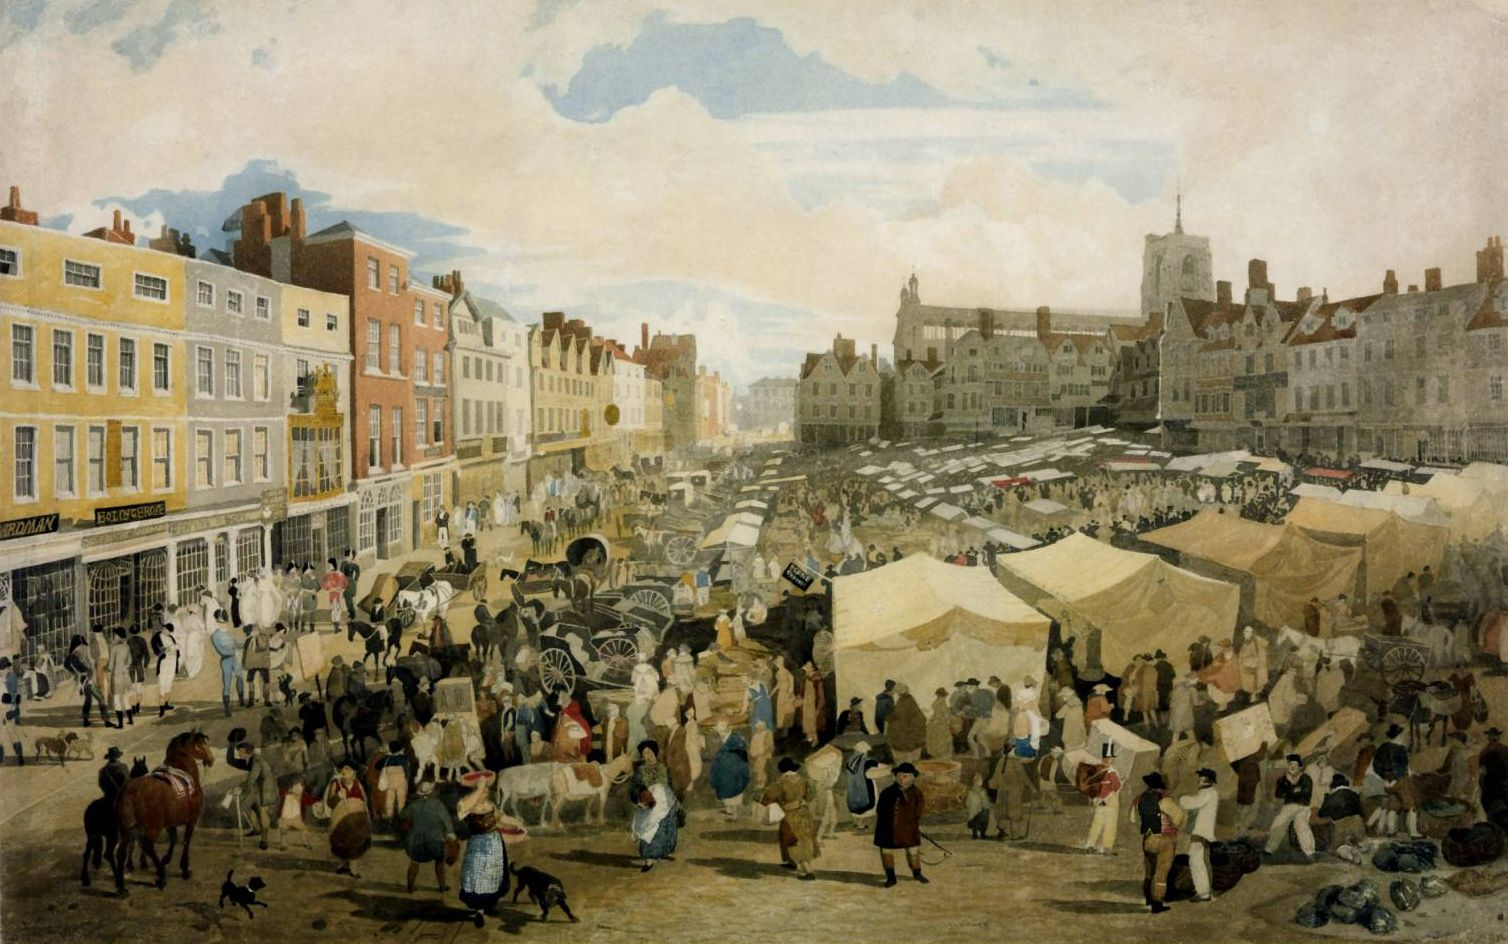 Watercolor art history - 1809 Norwich Market Place Watercolor Art Historynorfolkwatercolours19th